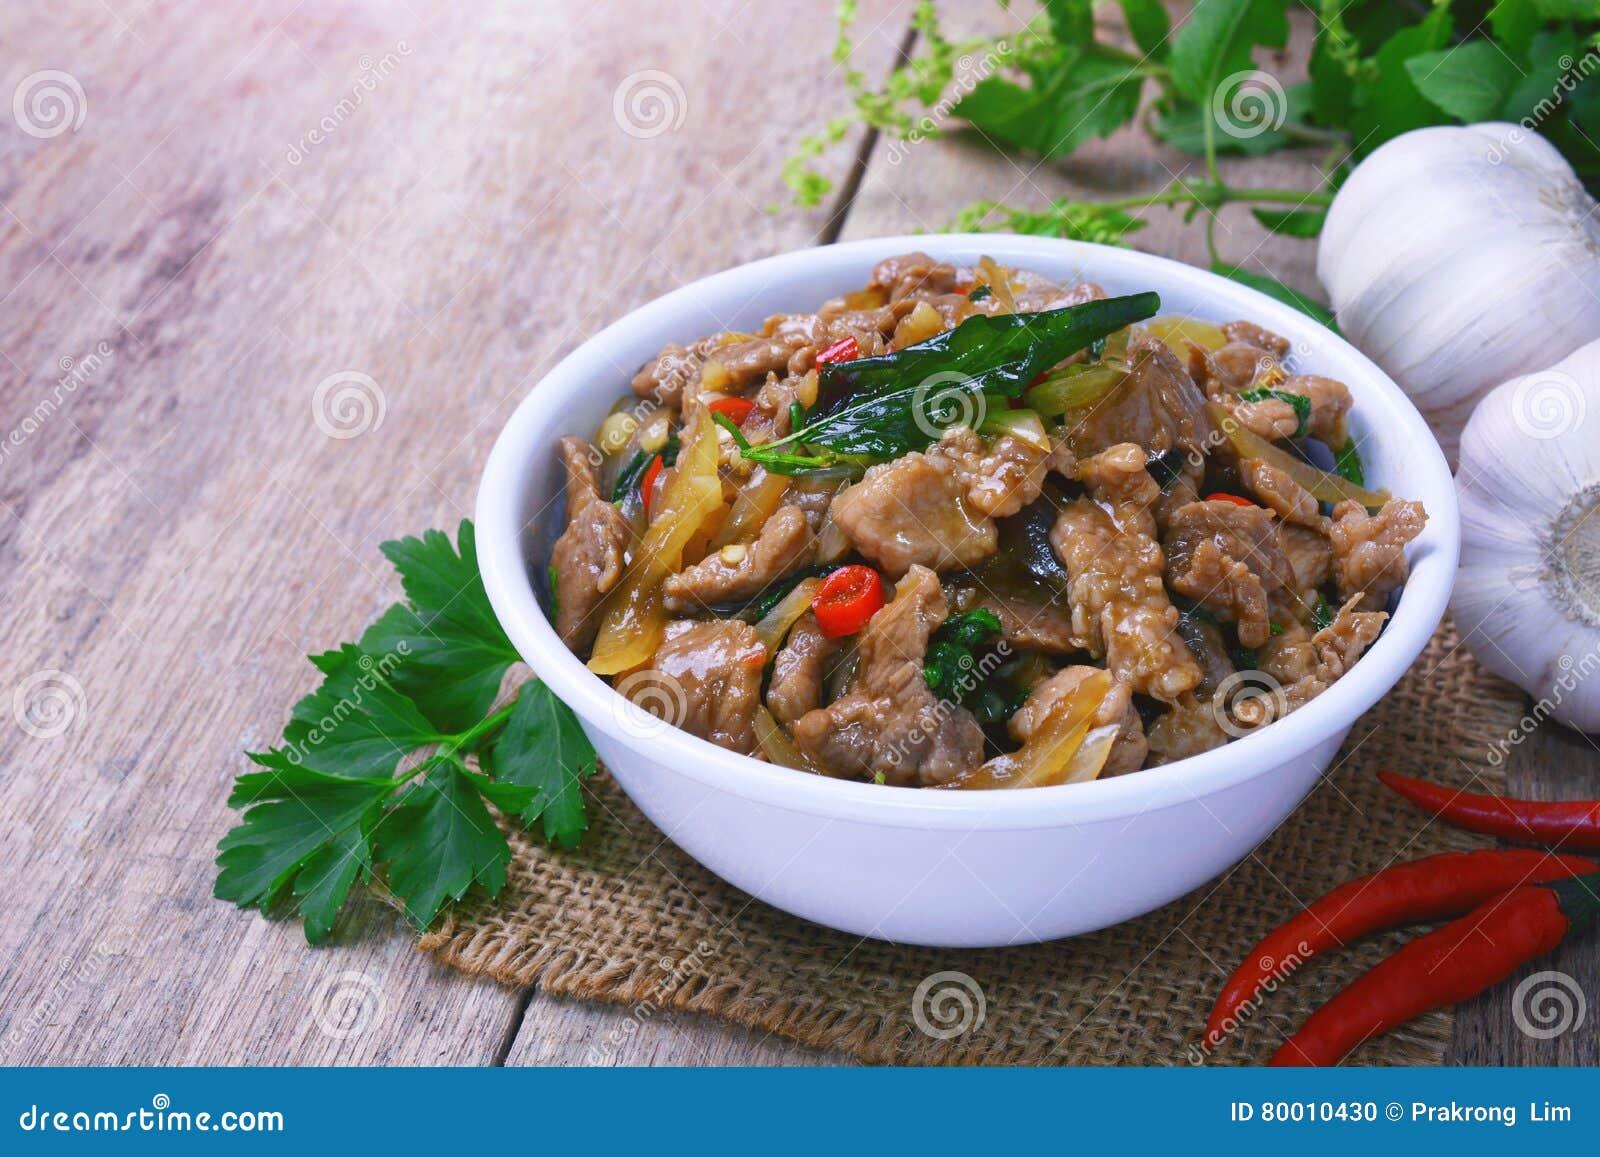 Stir fried hot and spicy sauce with pork, crispy basil leaf on top.